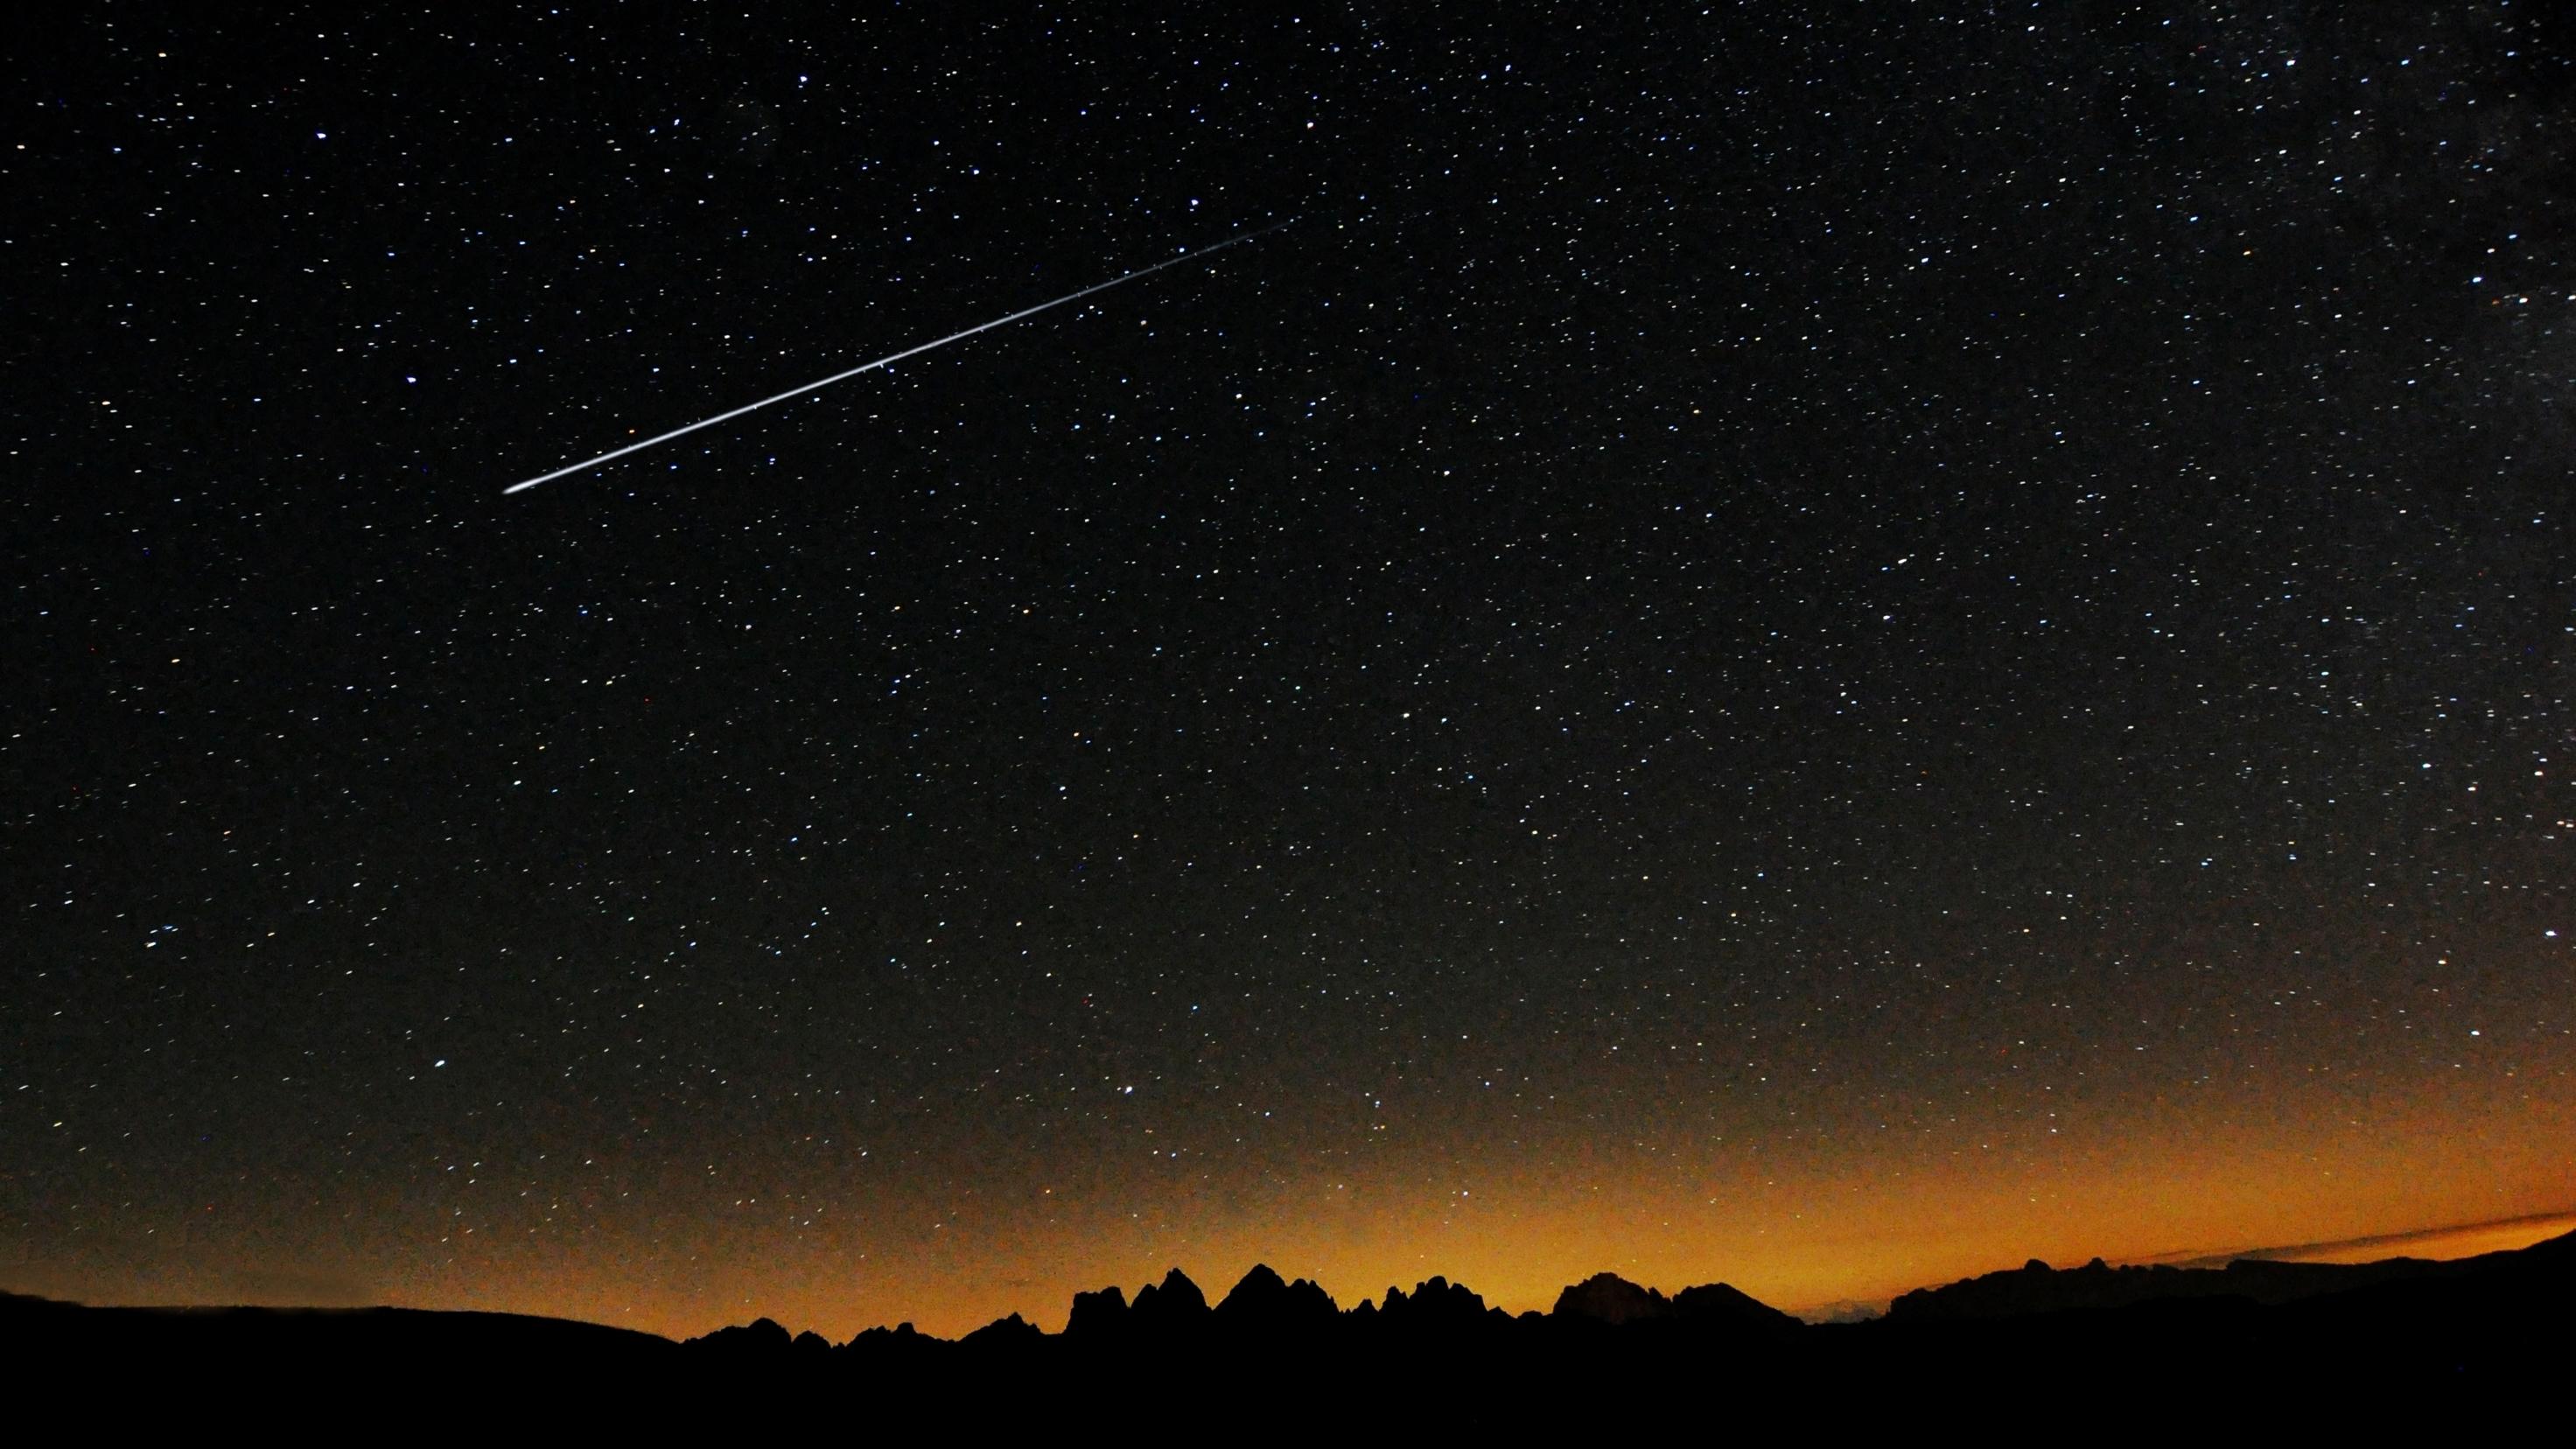 11/09 Shooting Star from Lurgod